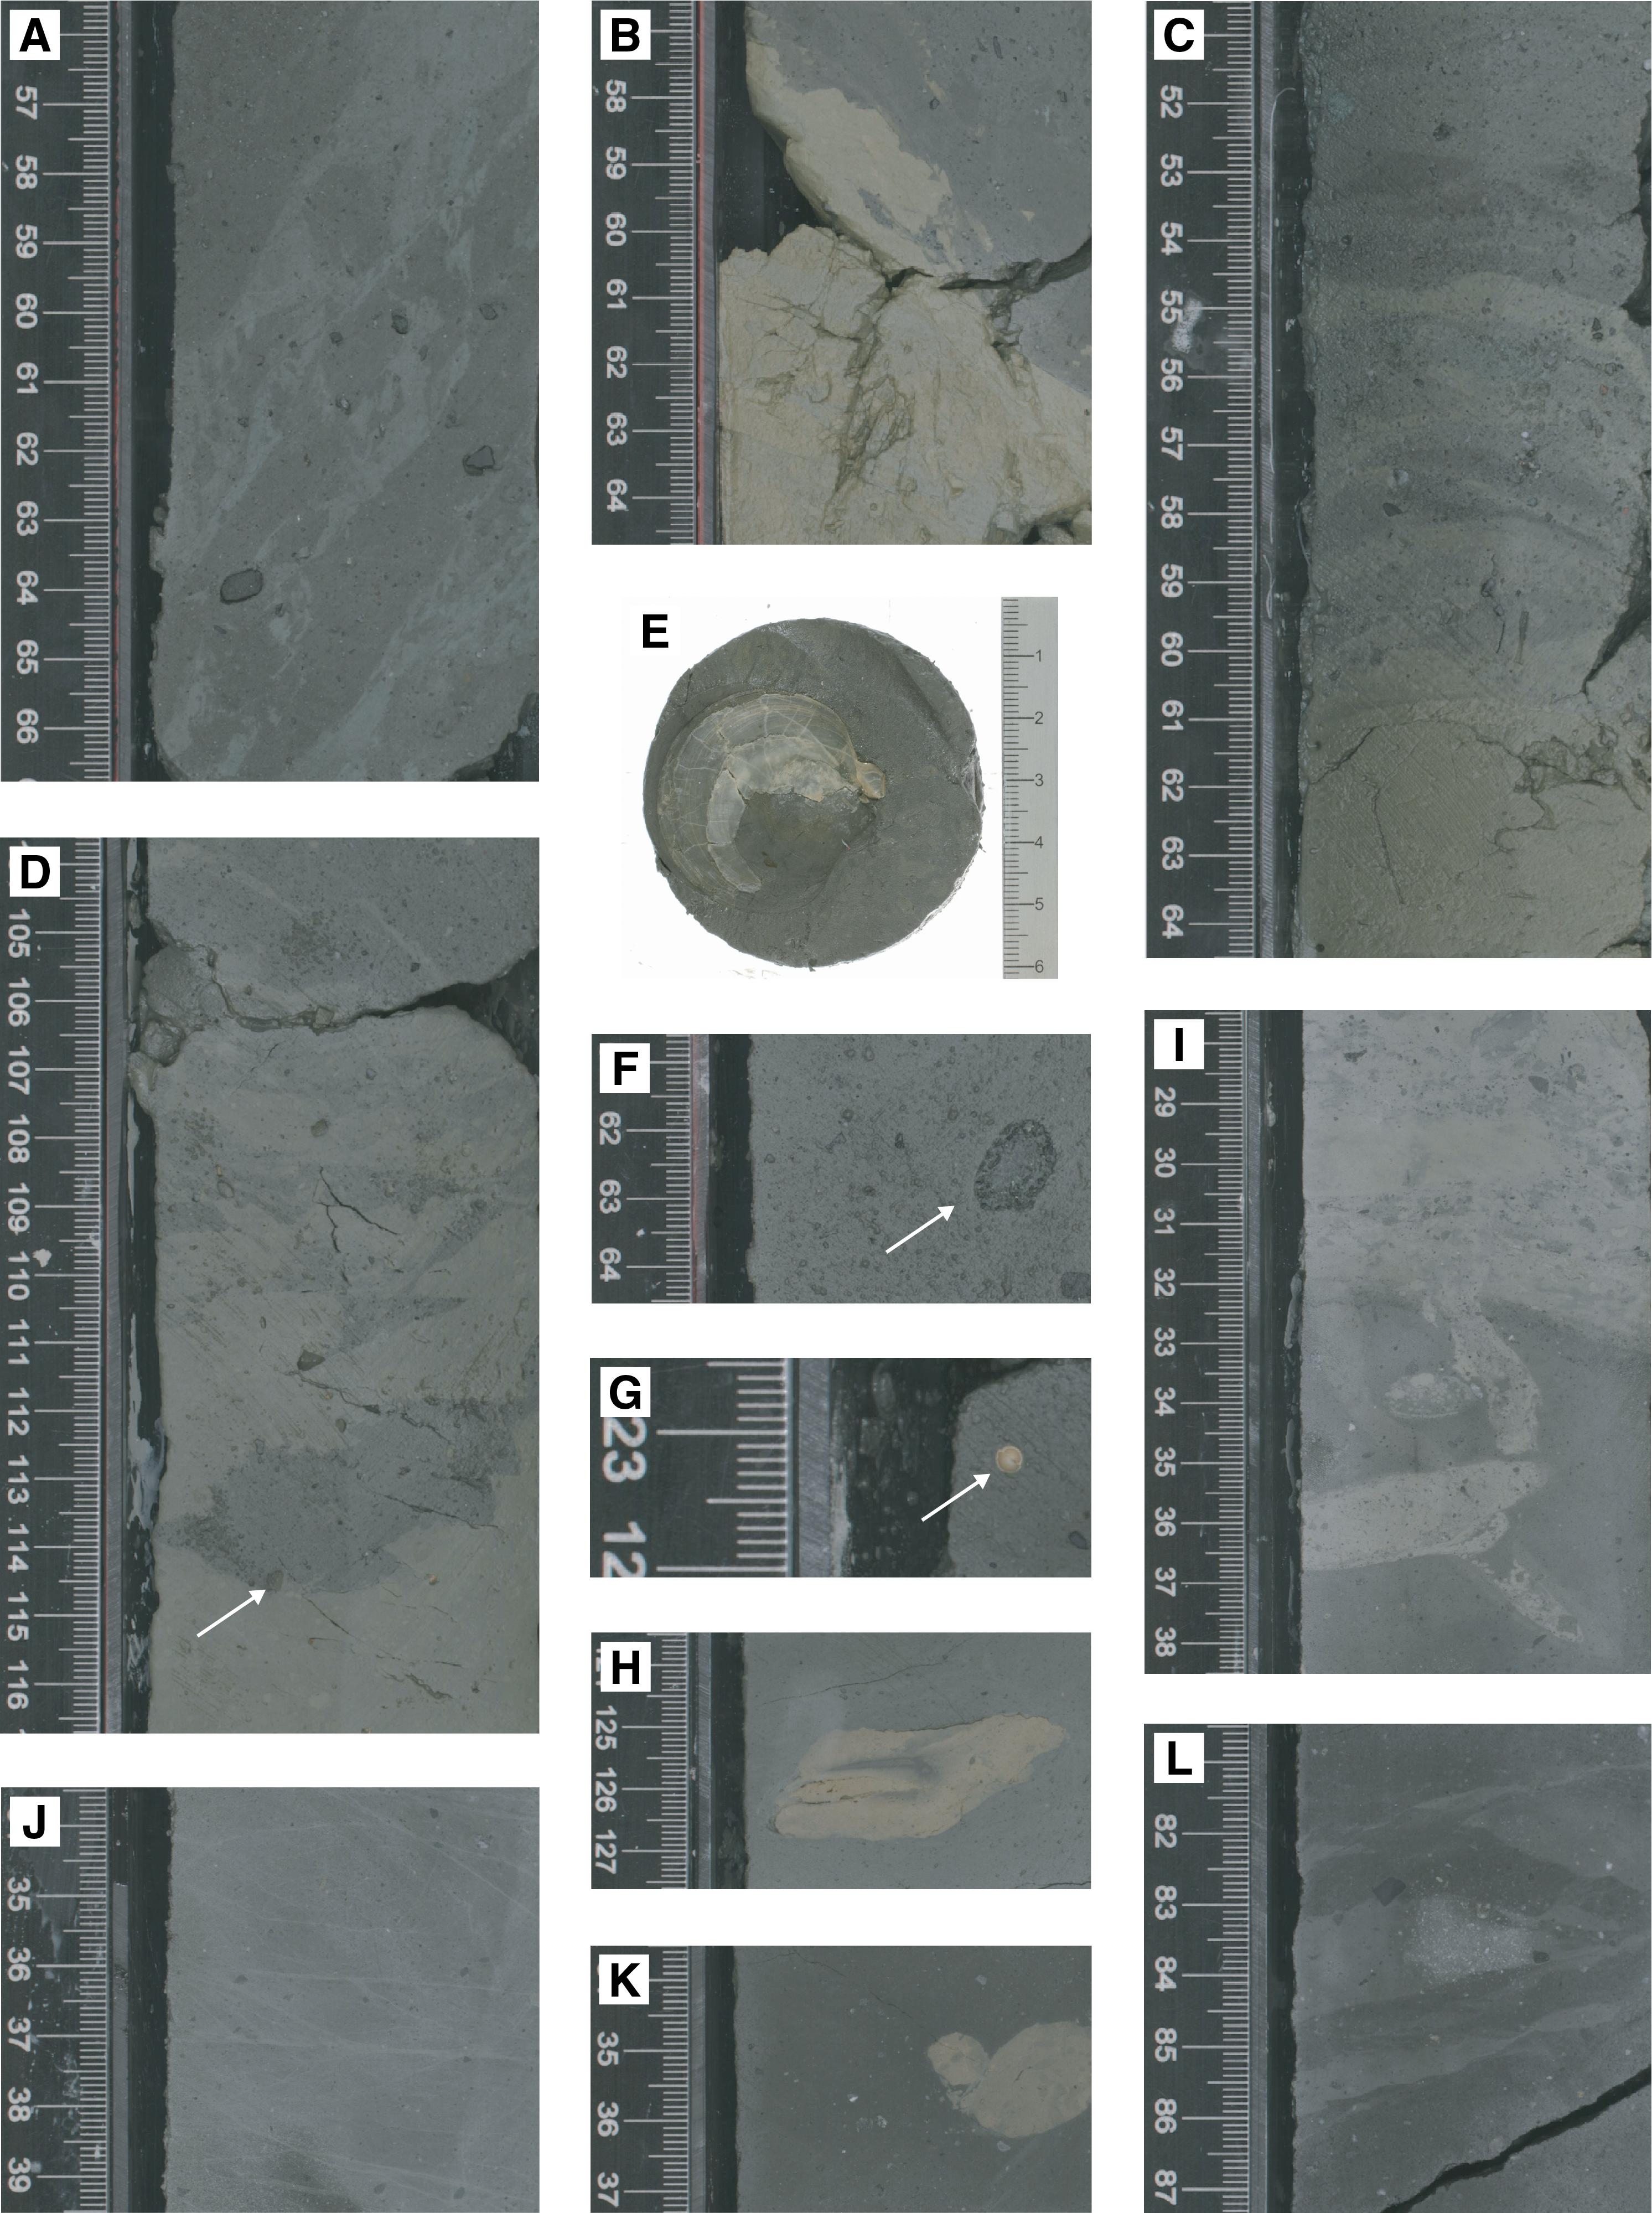 IODP Publications • Volume 374 expedition reports • Site U1521